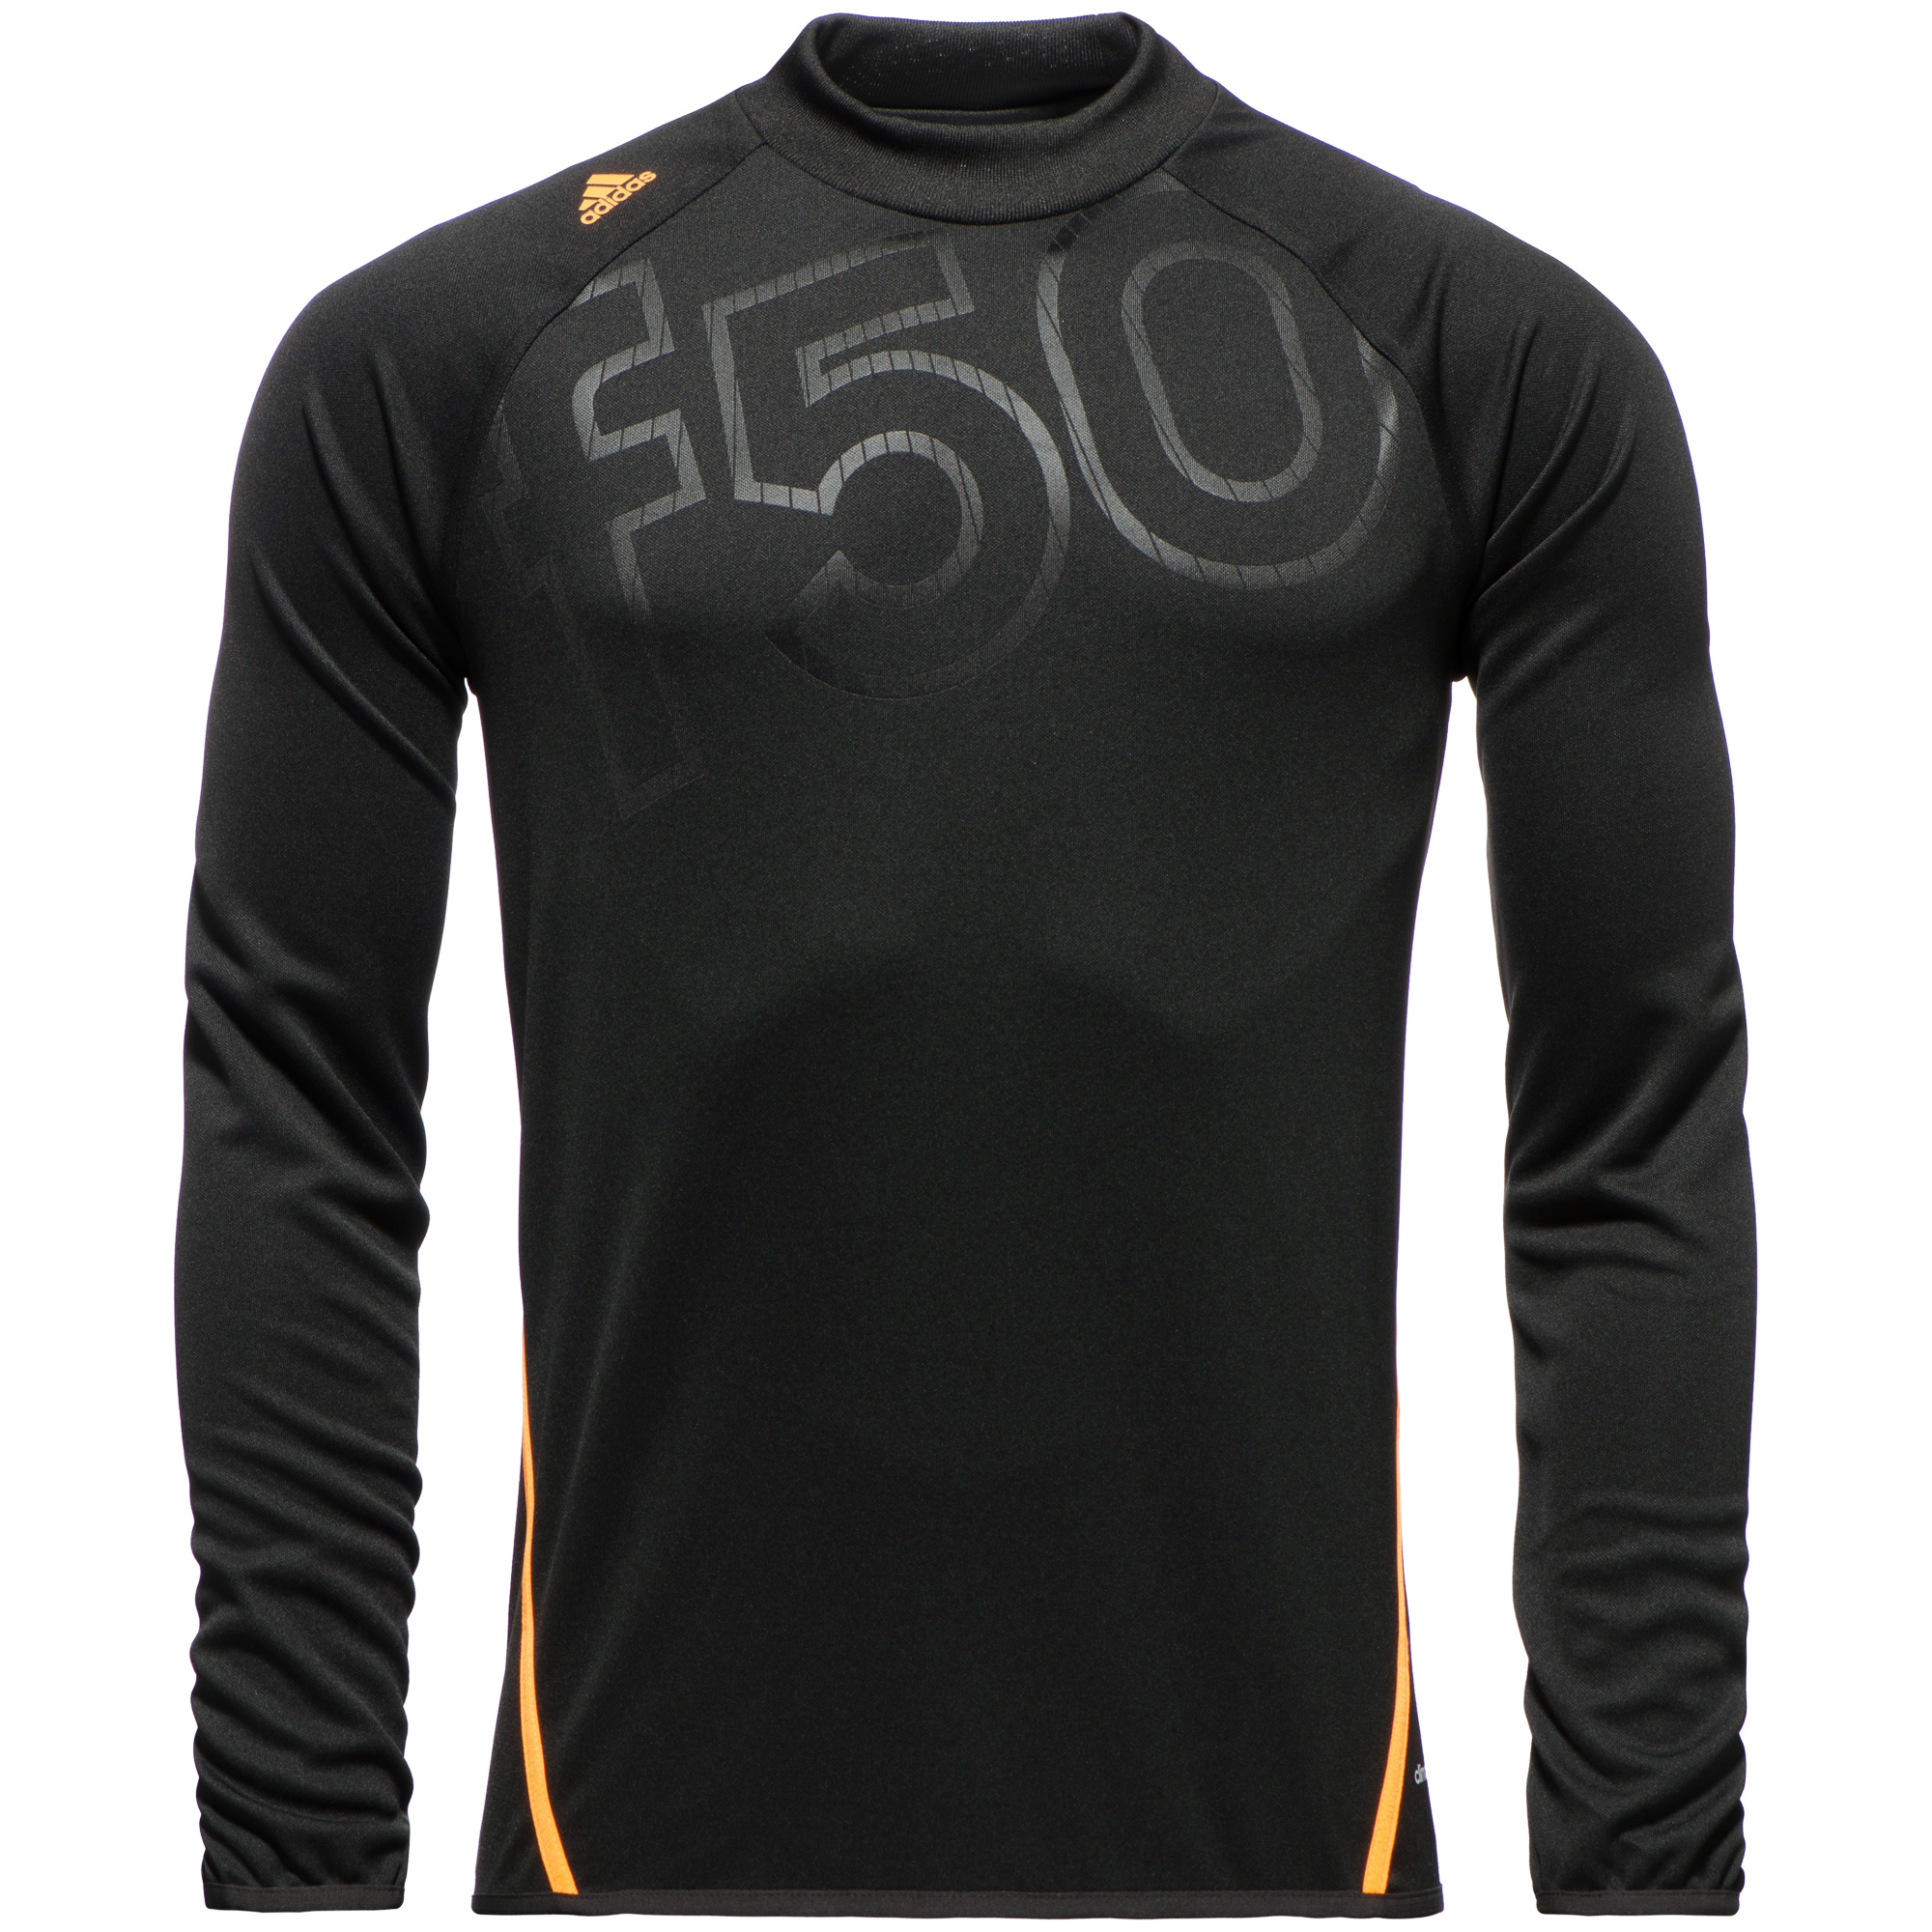 Adidas Orange t Shirt Adidas Training Shirt F50